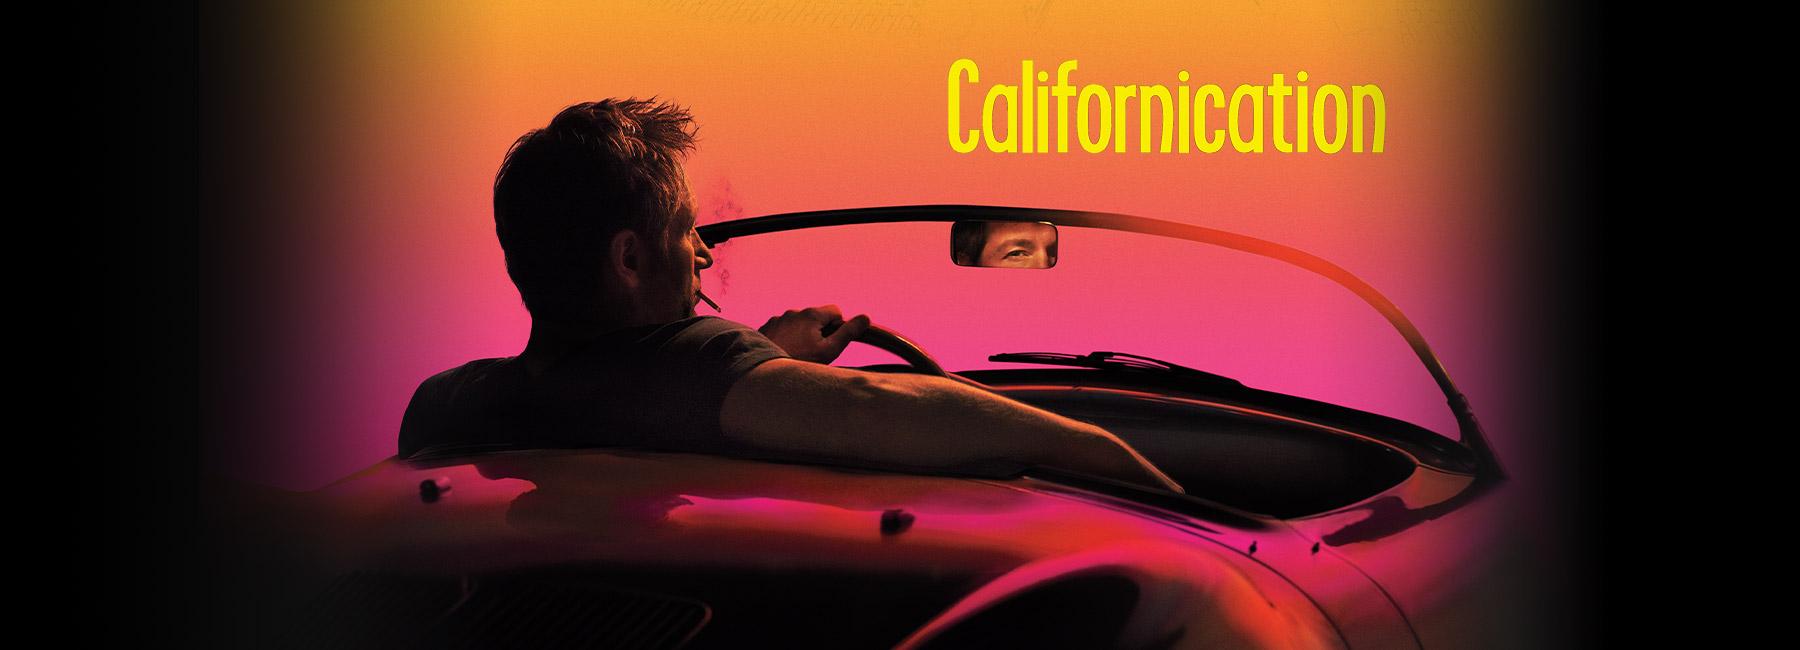 Sky X Californication